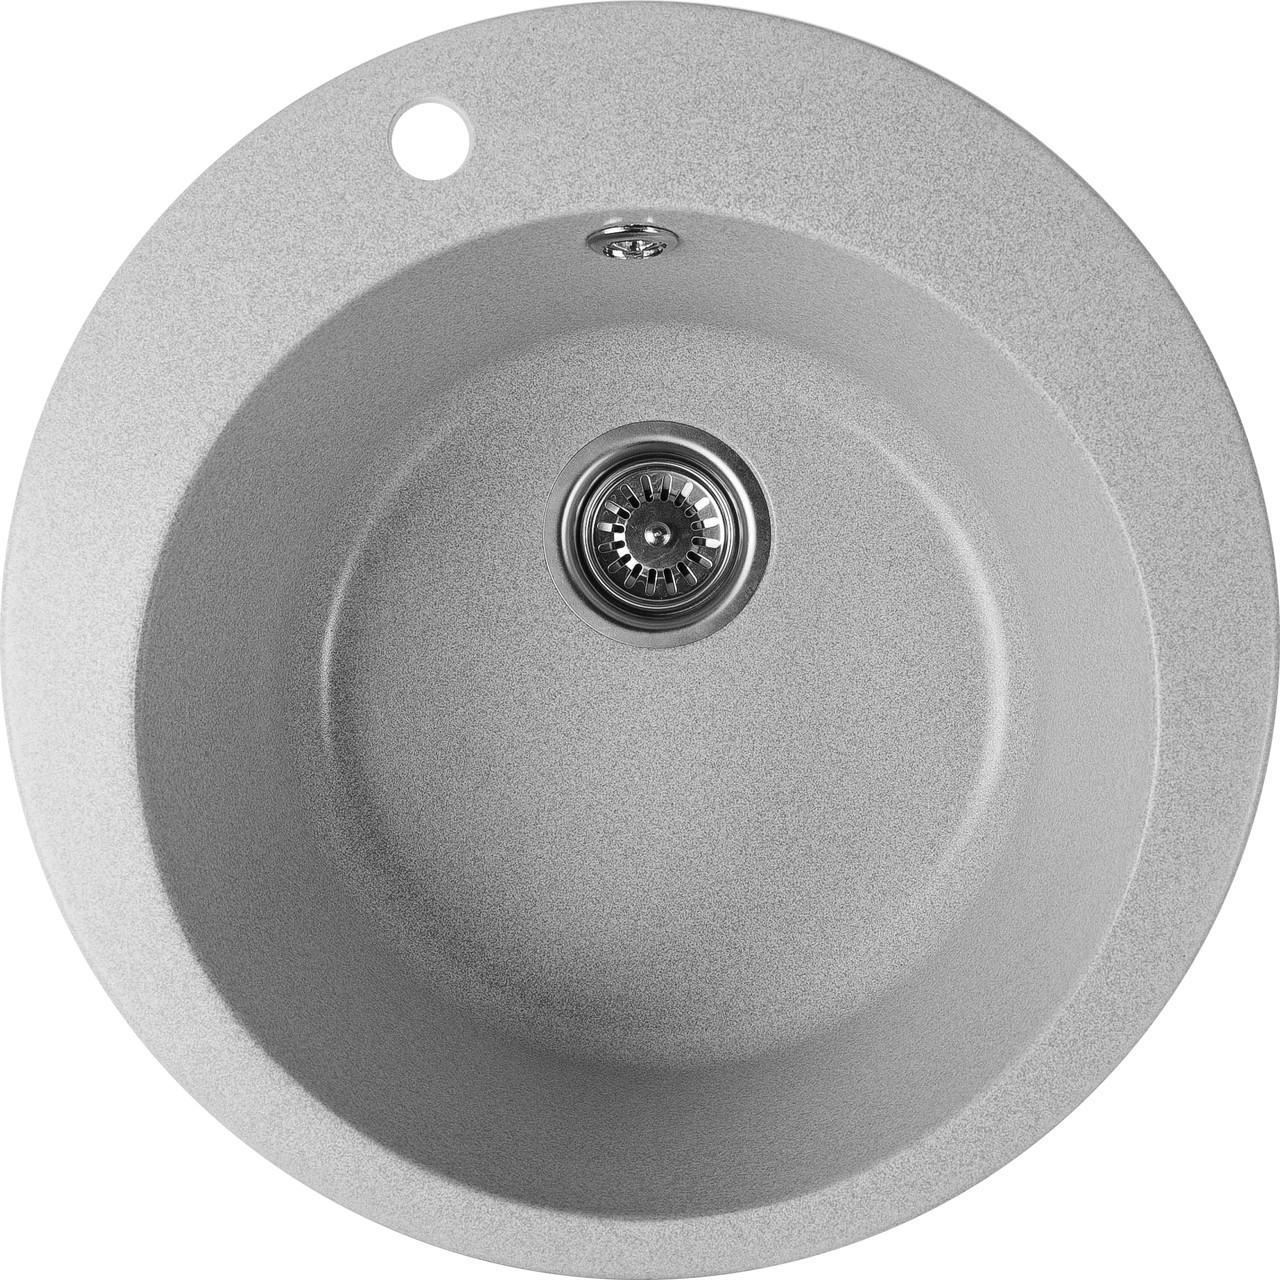 Гранитная кухонная раковина Valetti Premium модель №7 серая 500